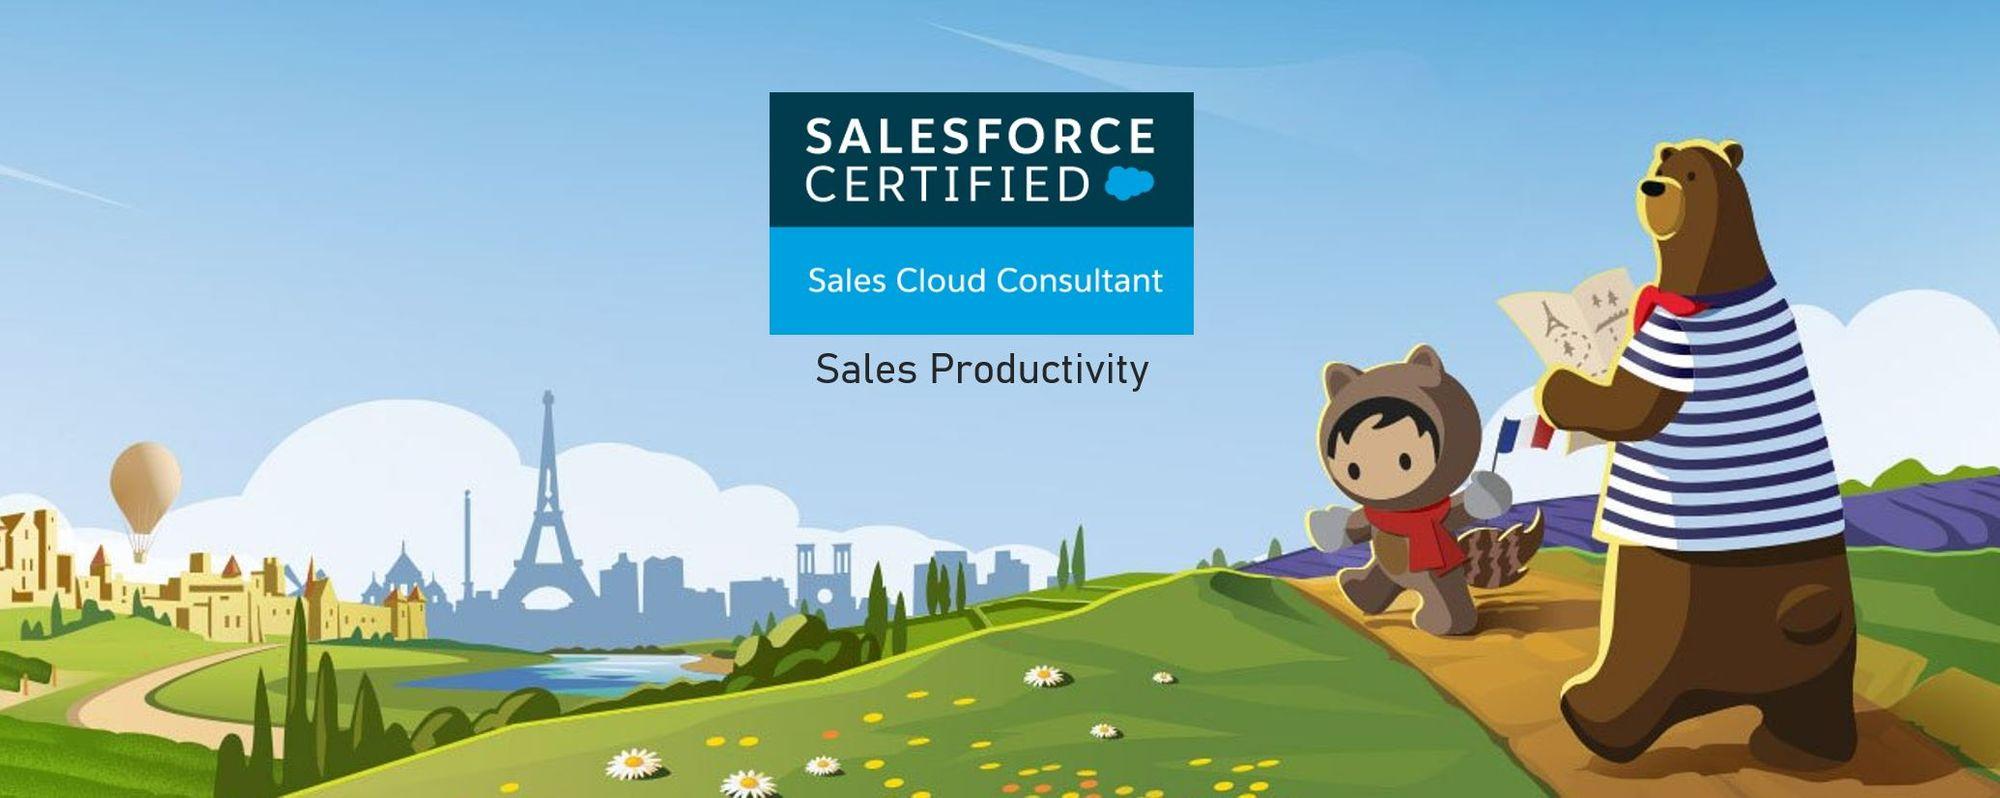 Salesforce Sales Cloud Consultant Exam Preparation: Sales Productivity